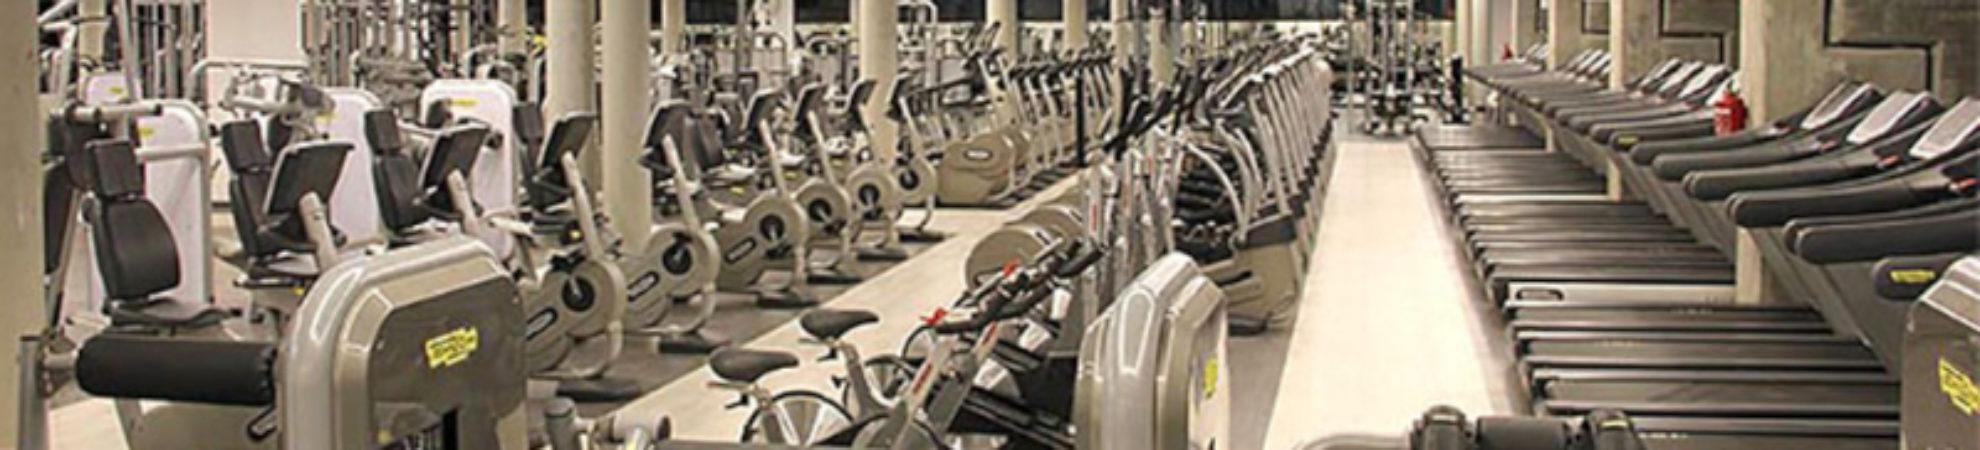 Gym Body Factory